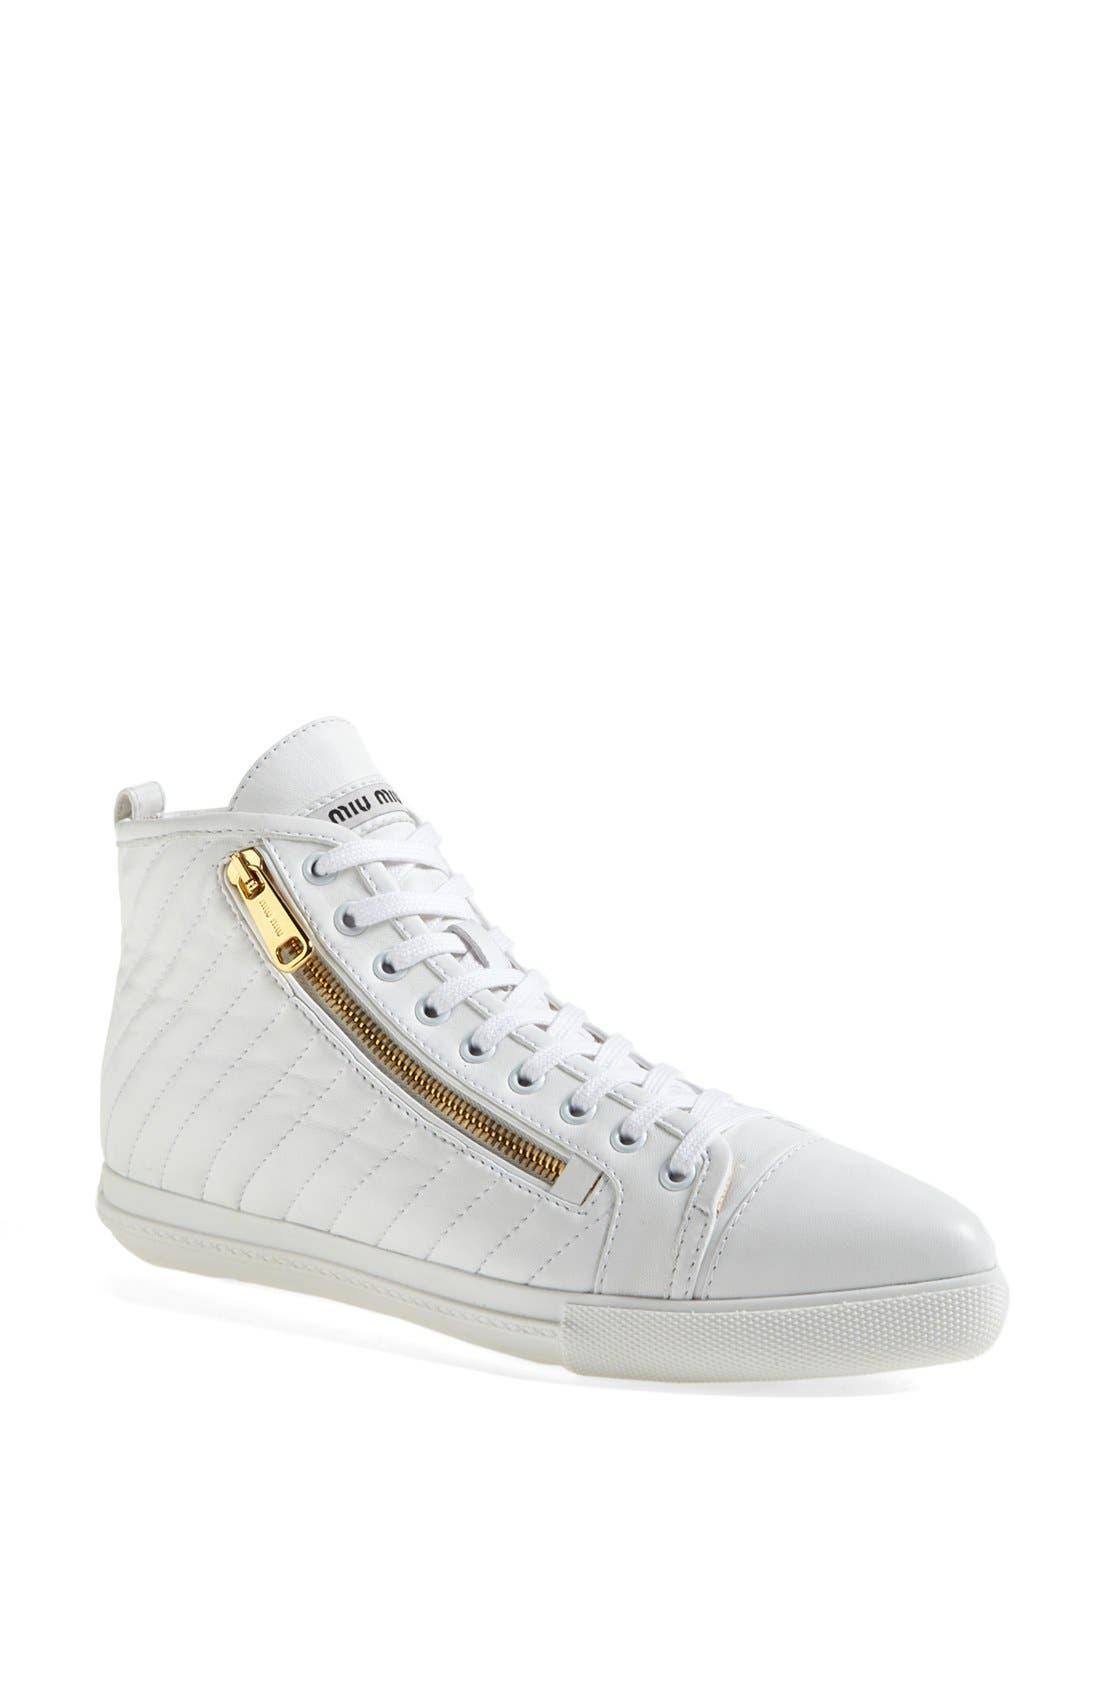 Alternate Image 1 Selected - Miu Miu Side Zip High Top Sneaker